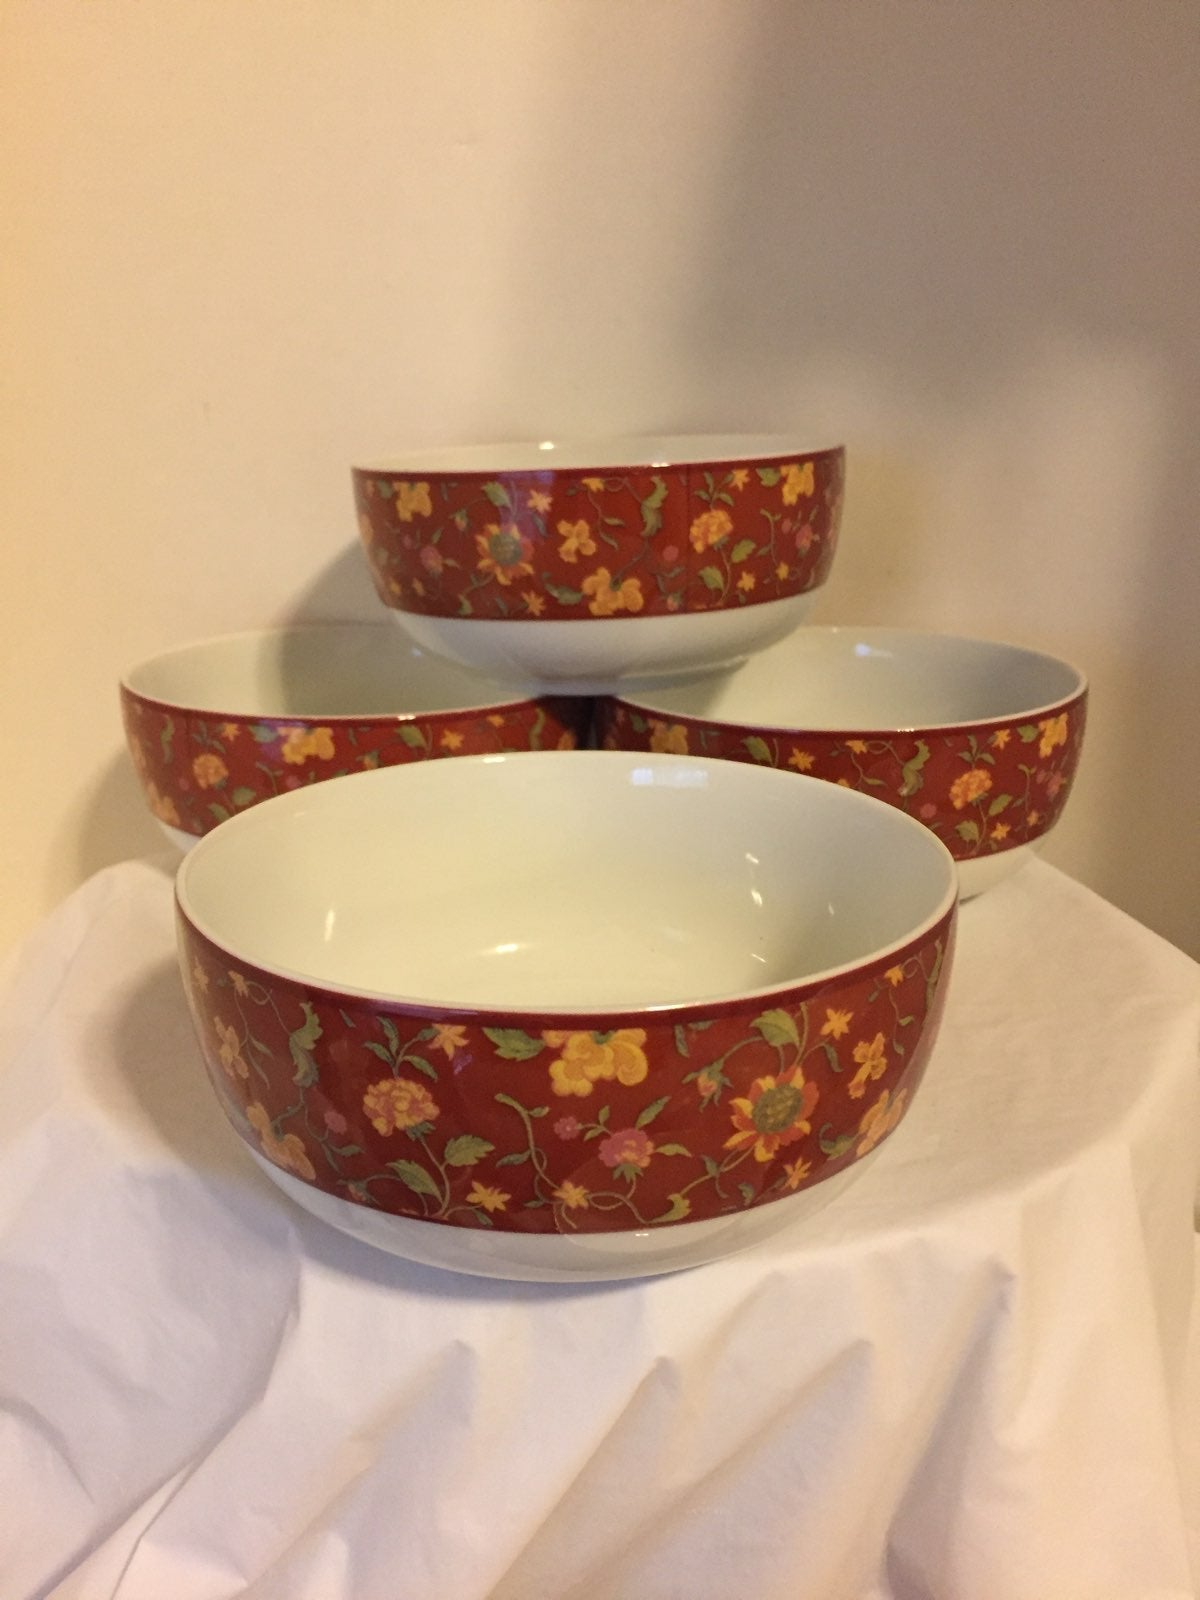 Neiman Marcus Bowls